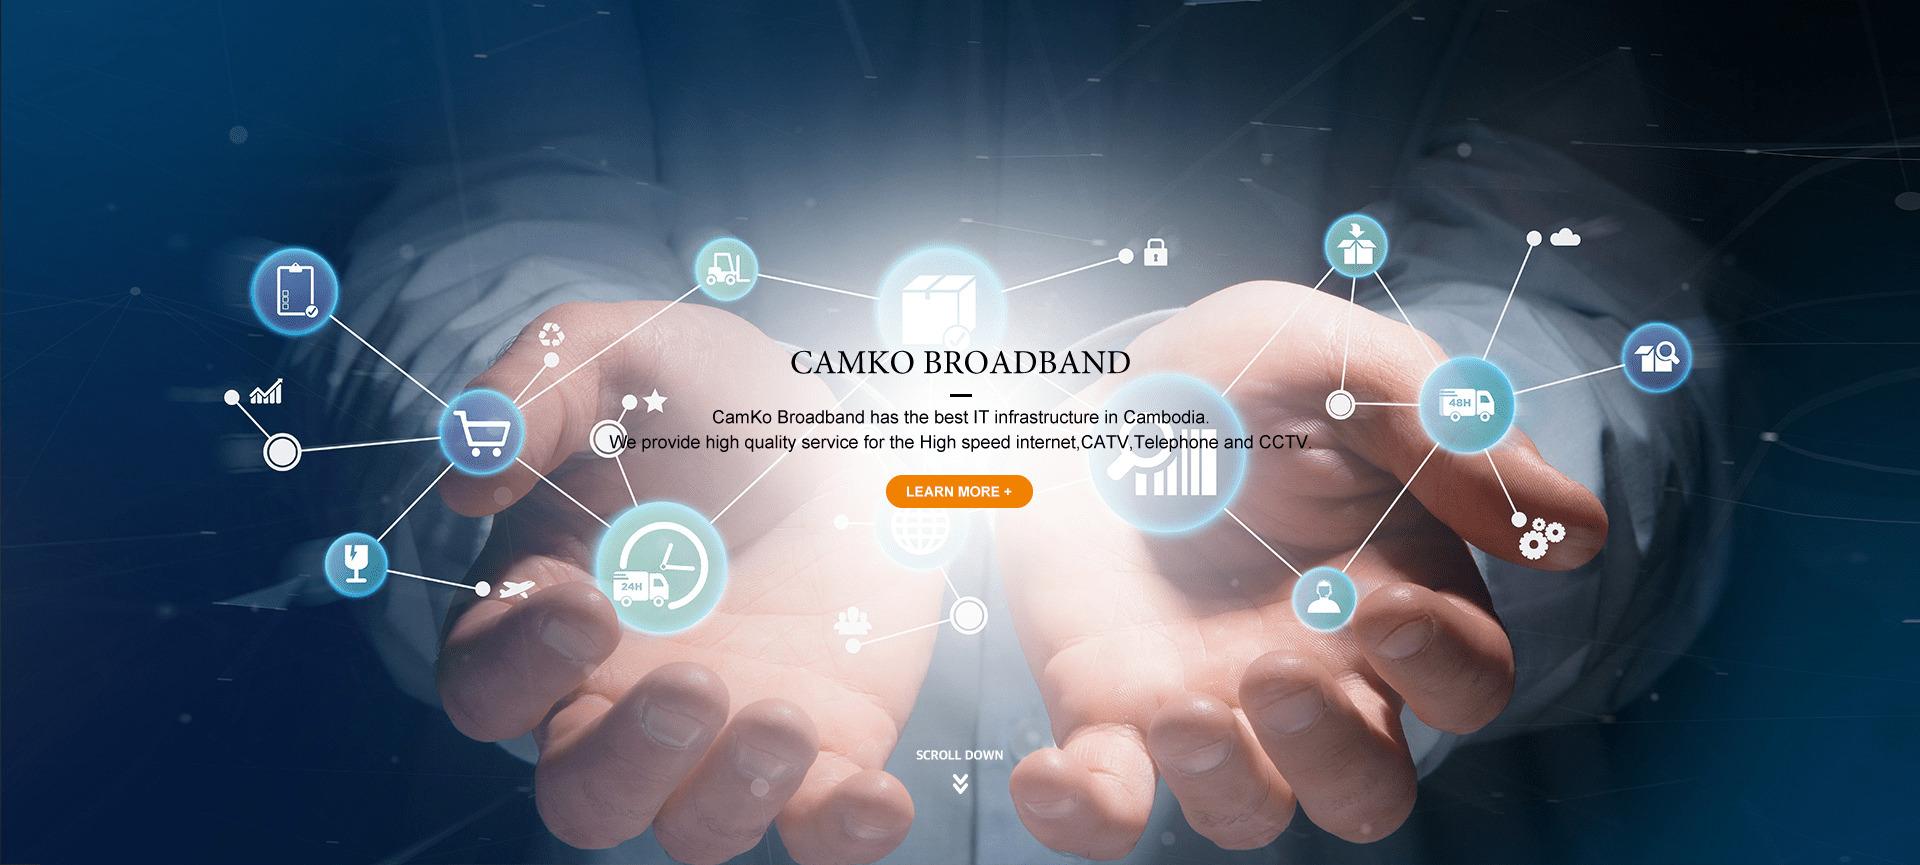 camko-broadband